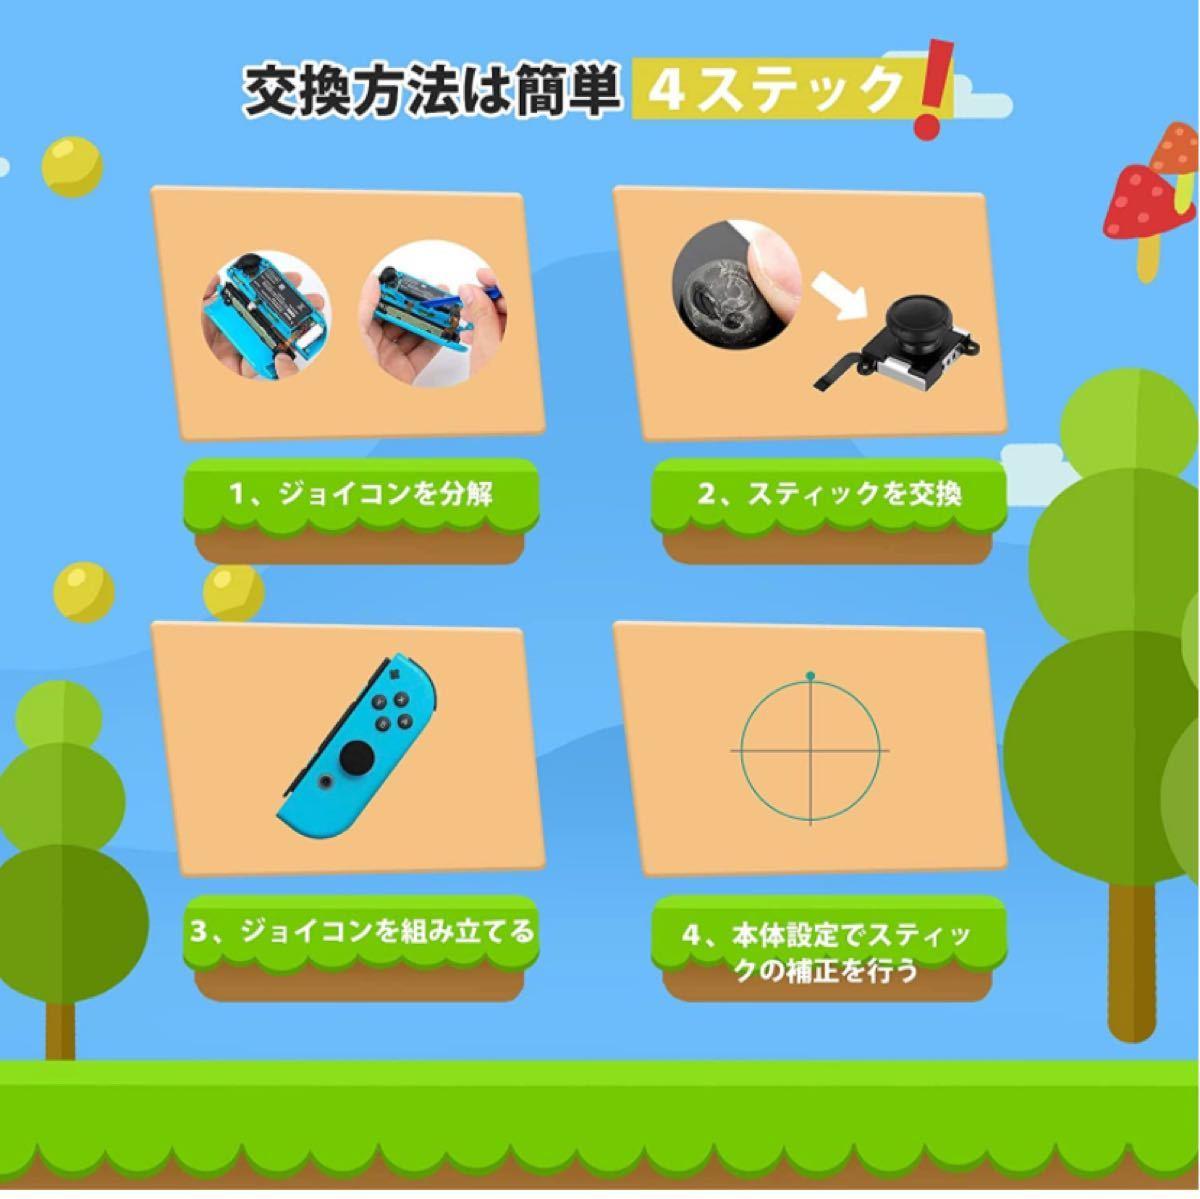 switchジョイコン 修理キット